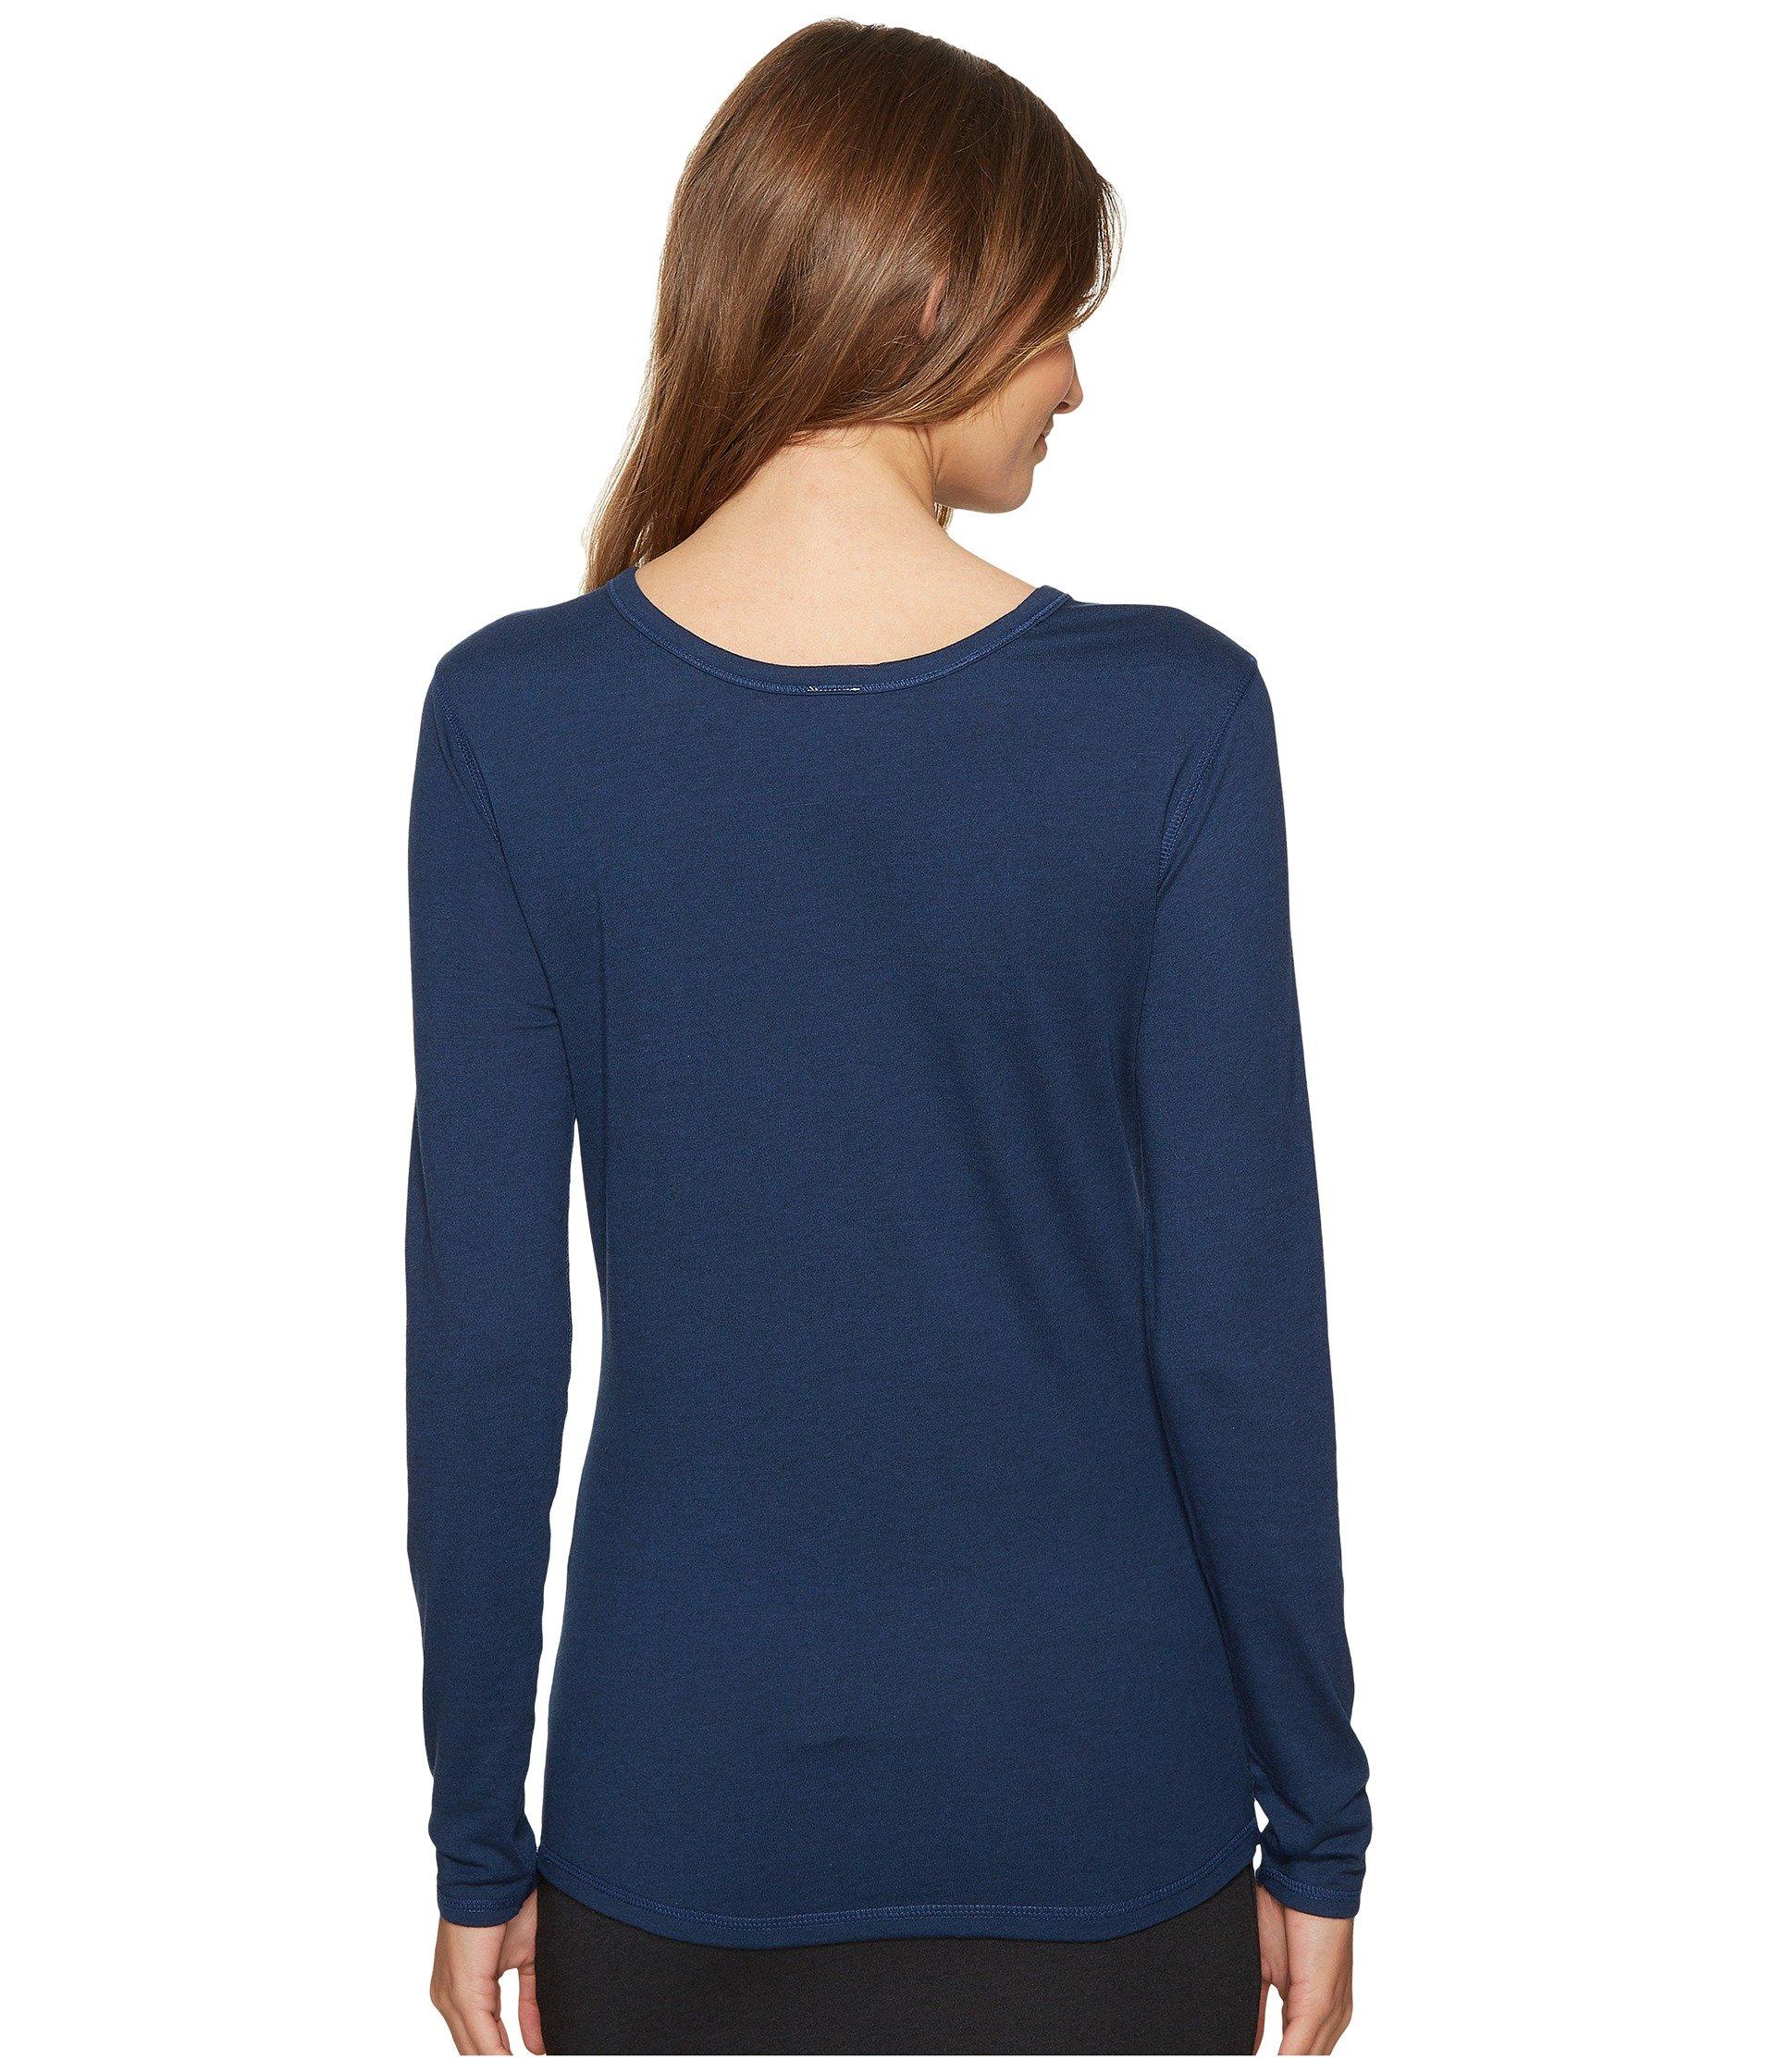 Long Reversible Sleeve back Jersey 4ward Clothing Top Navy Front 5qOCgxPwx